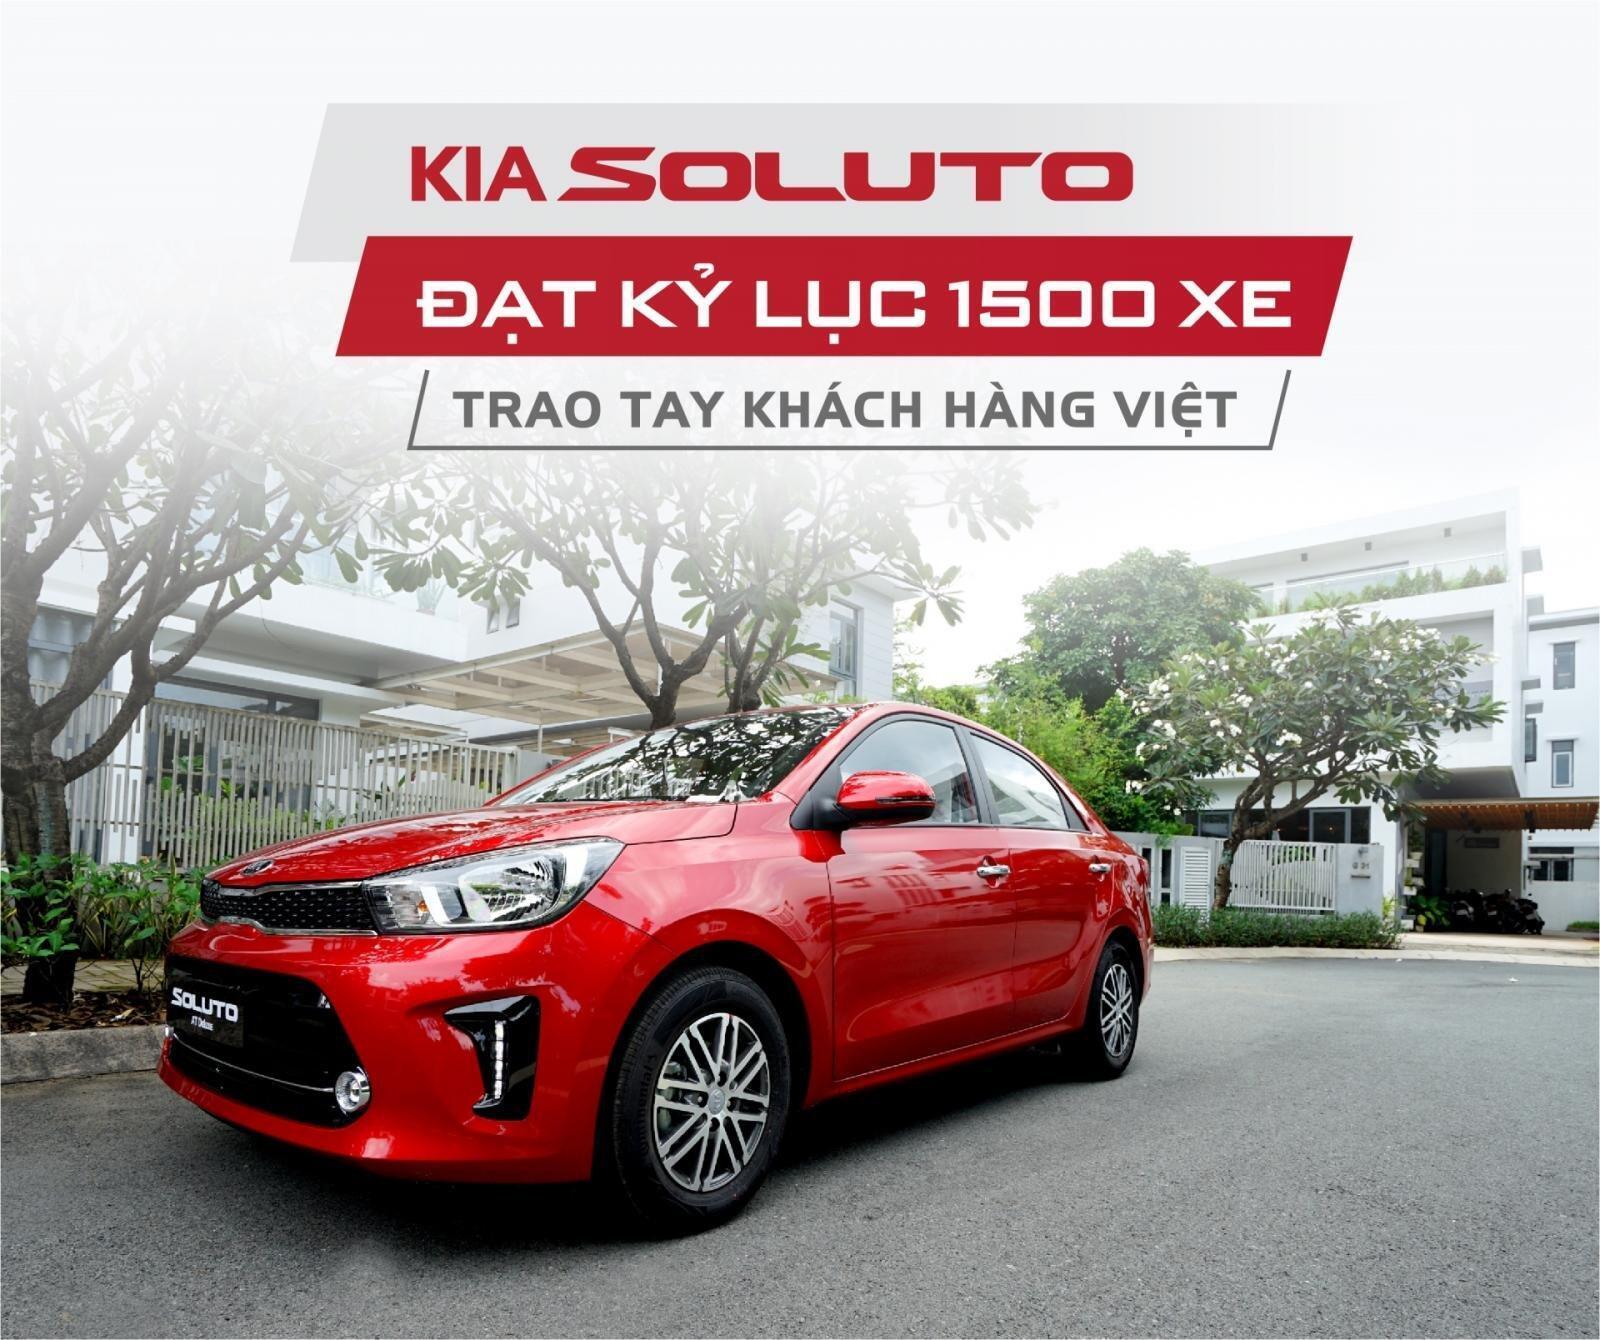 kia-soluto-ban-den-1-500-xe-doi-thu-nang-ky-trong-phan-khuc-b